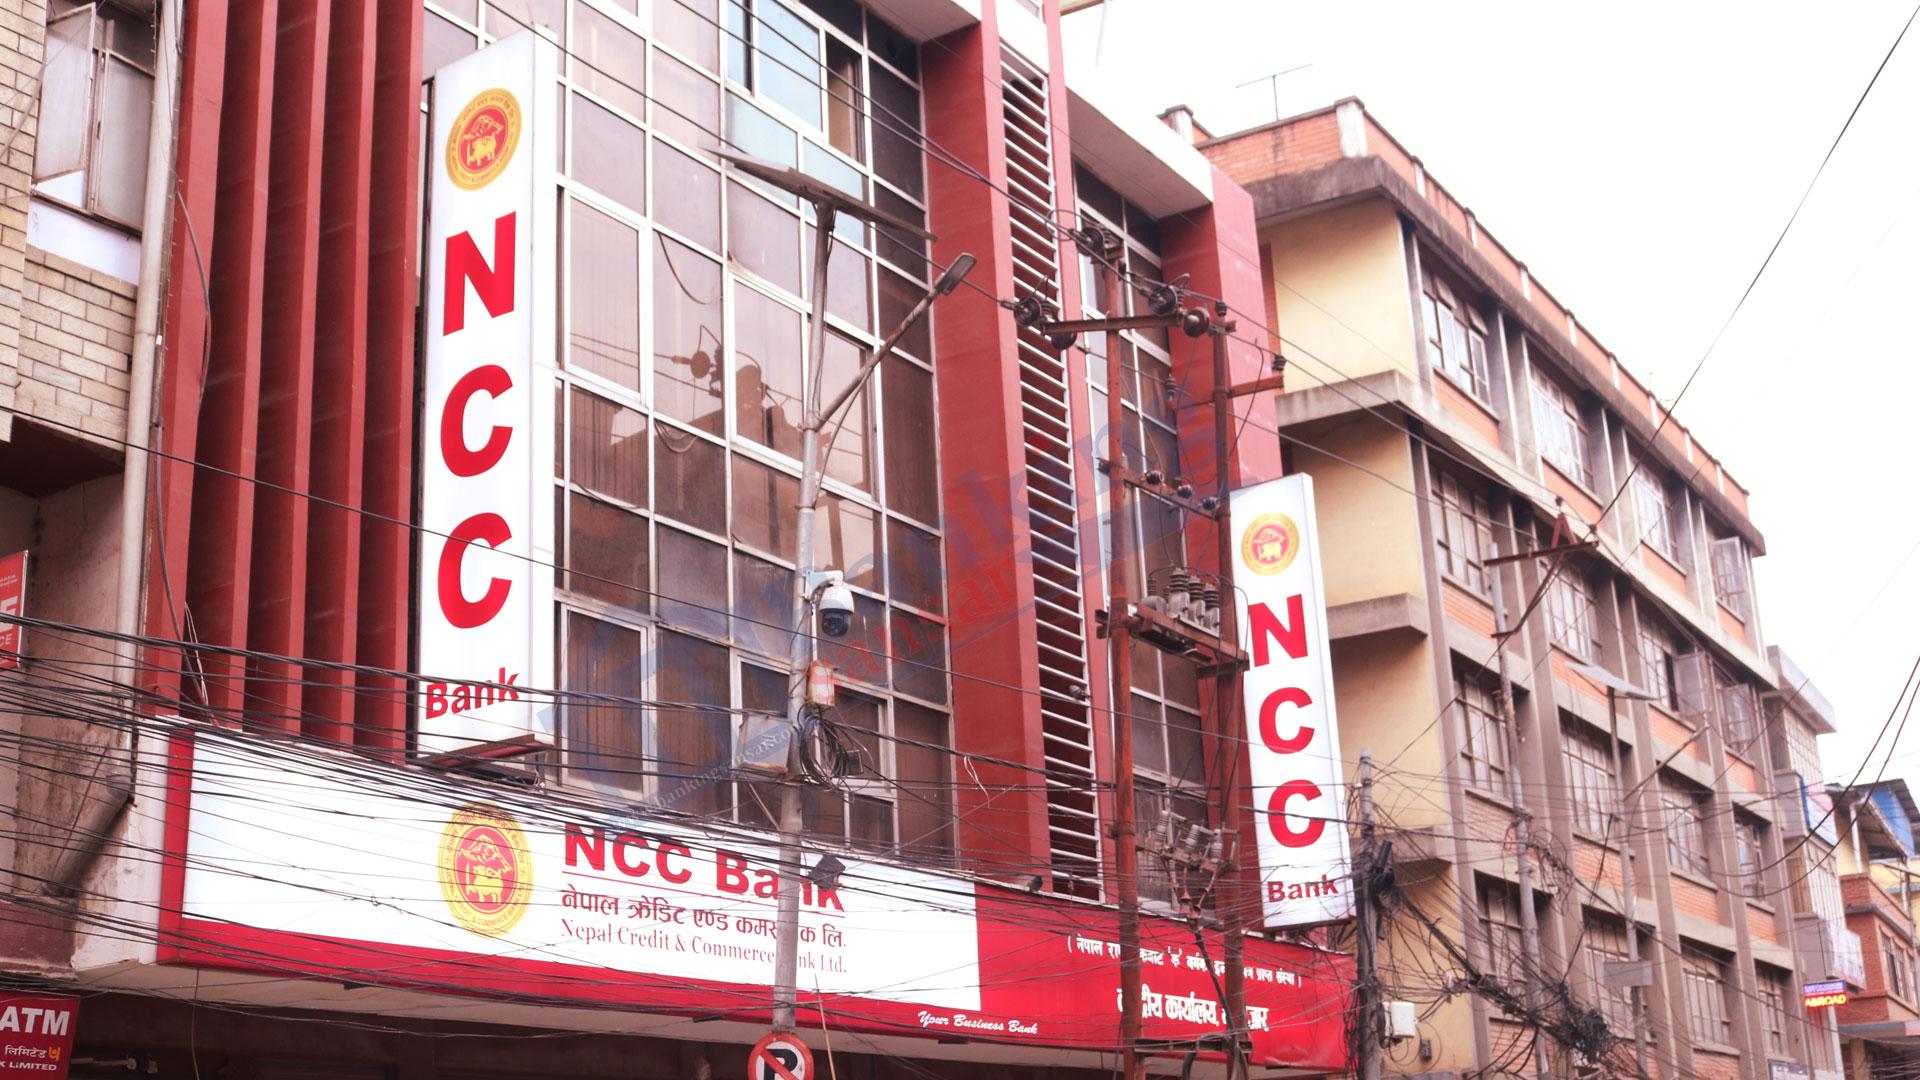 NCC Bank